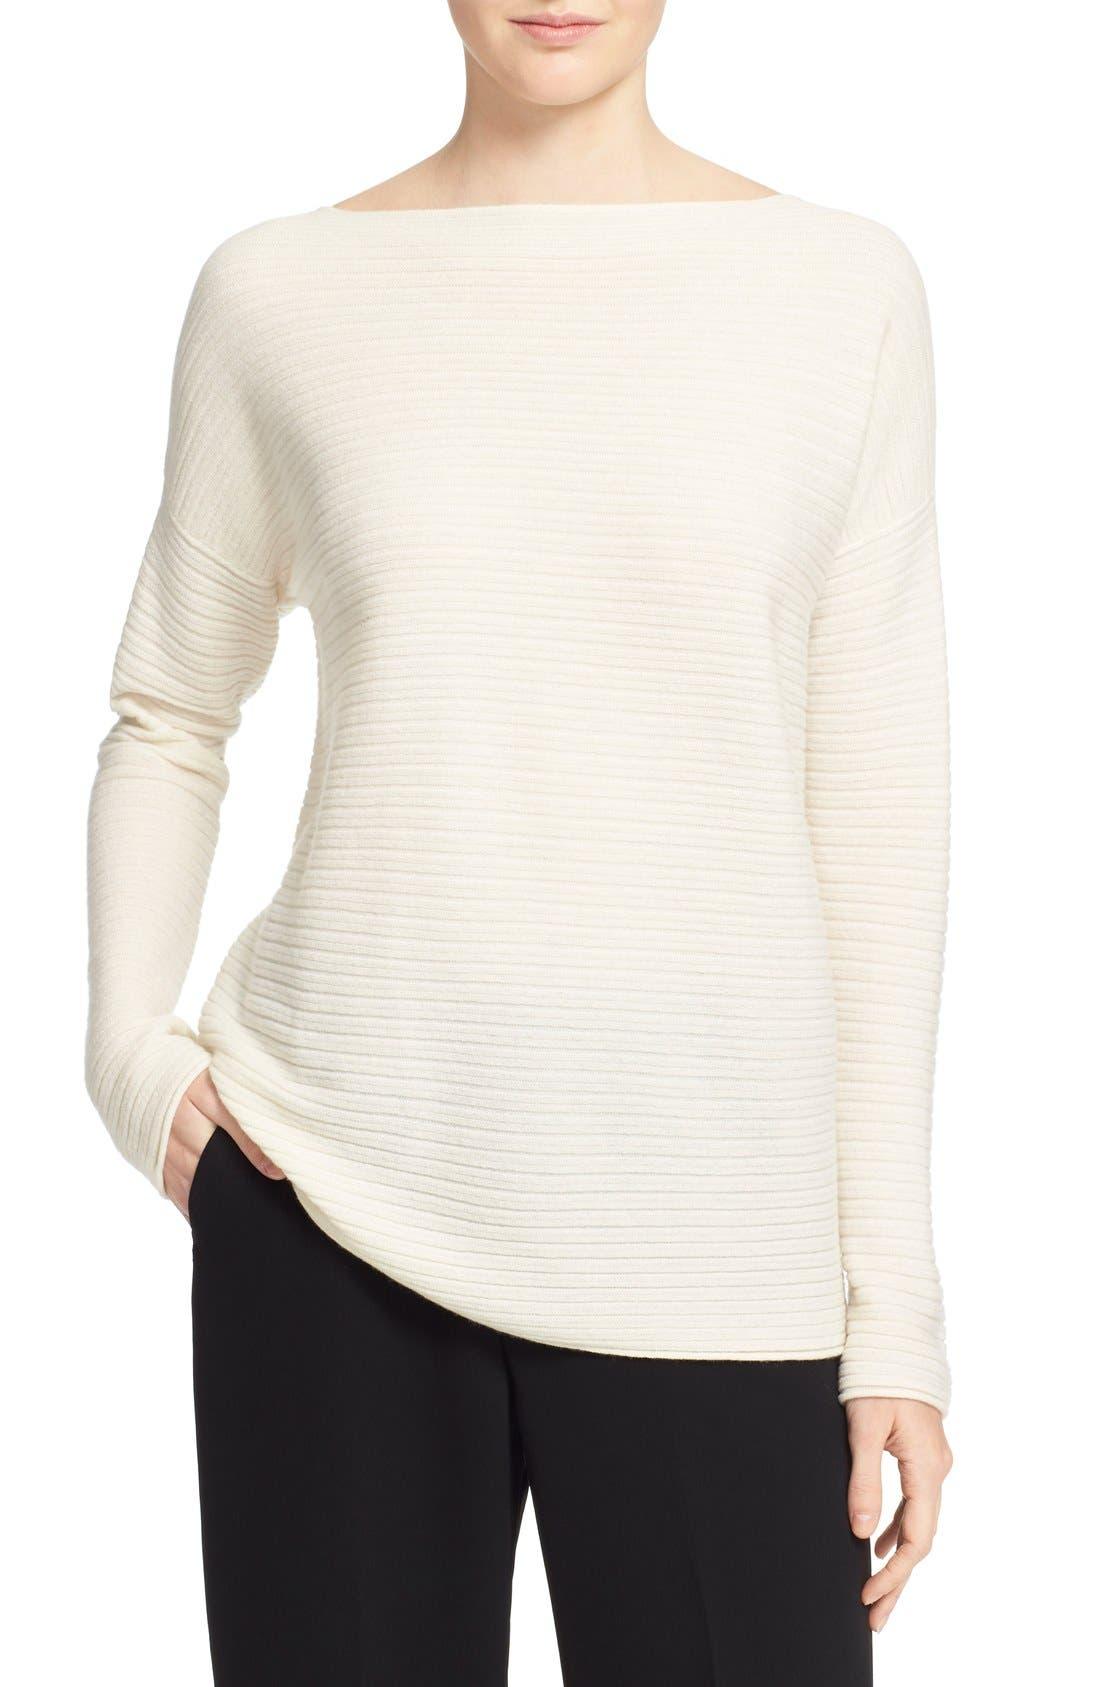 Main Image - Vince Boatneck Horizontal Rib Cashmere Sweater